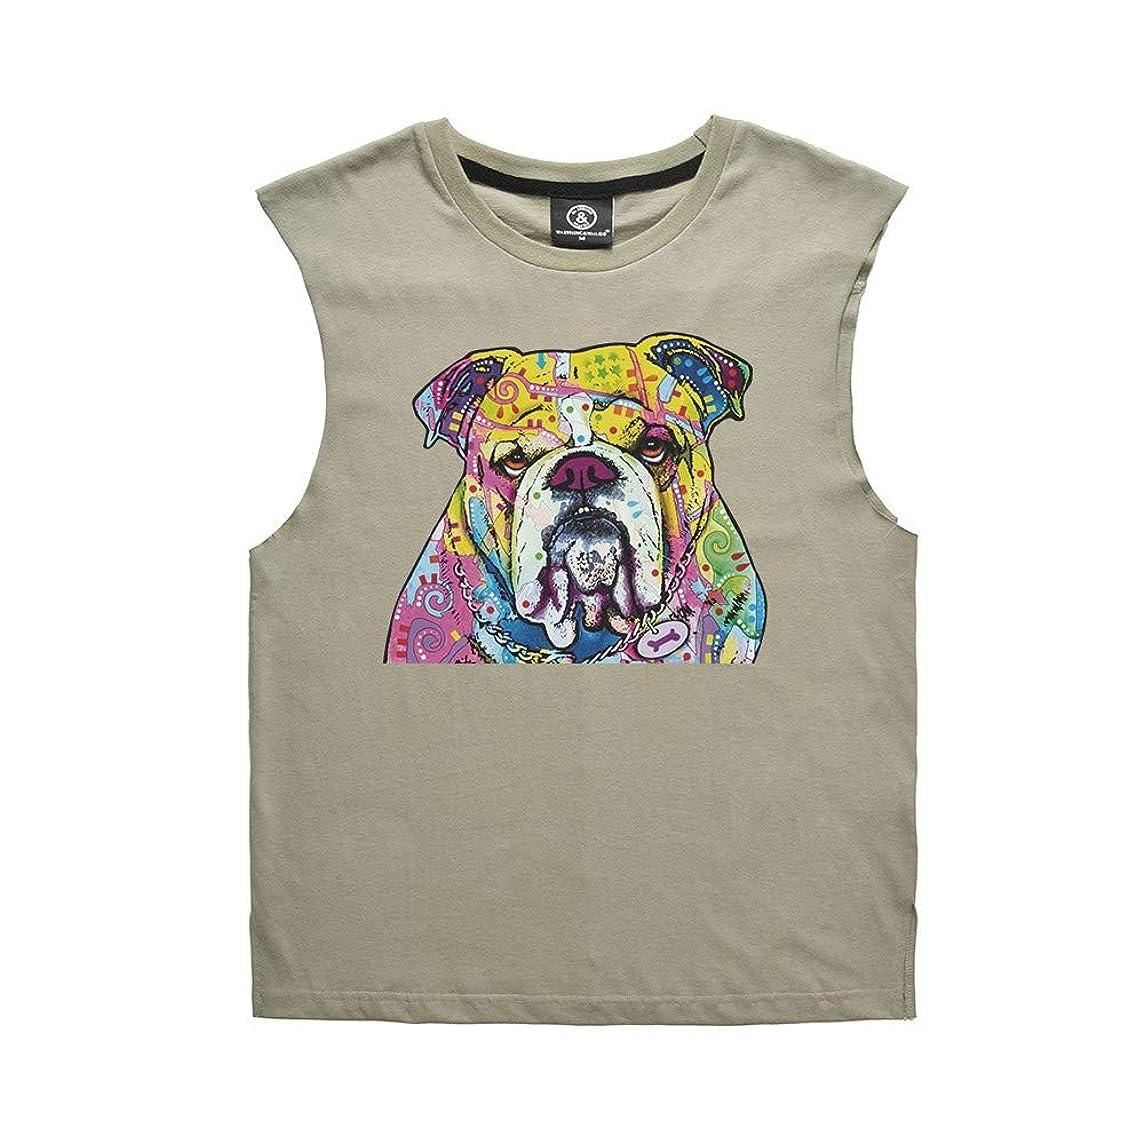 iHPH7 Men's Tank Tops Sleeveless T-Shirt #19052729